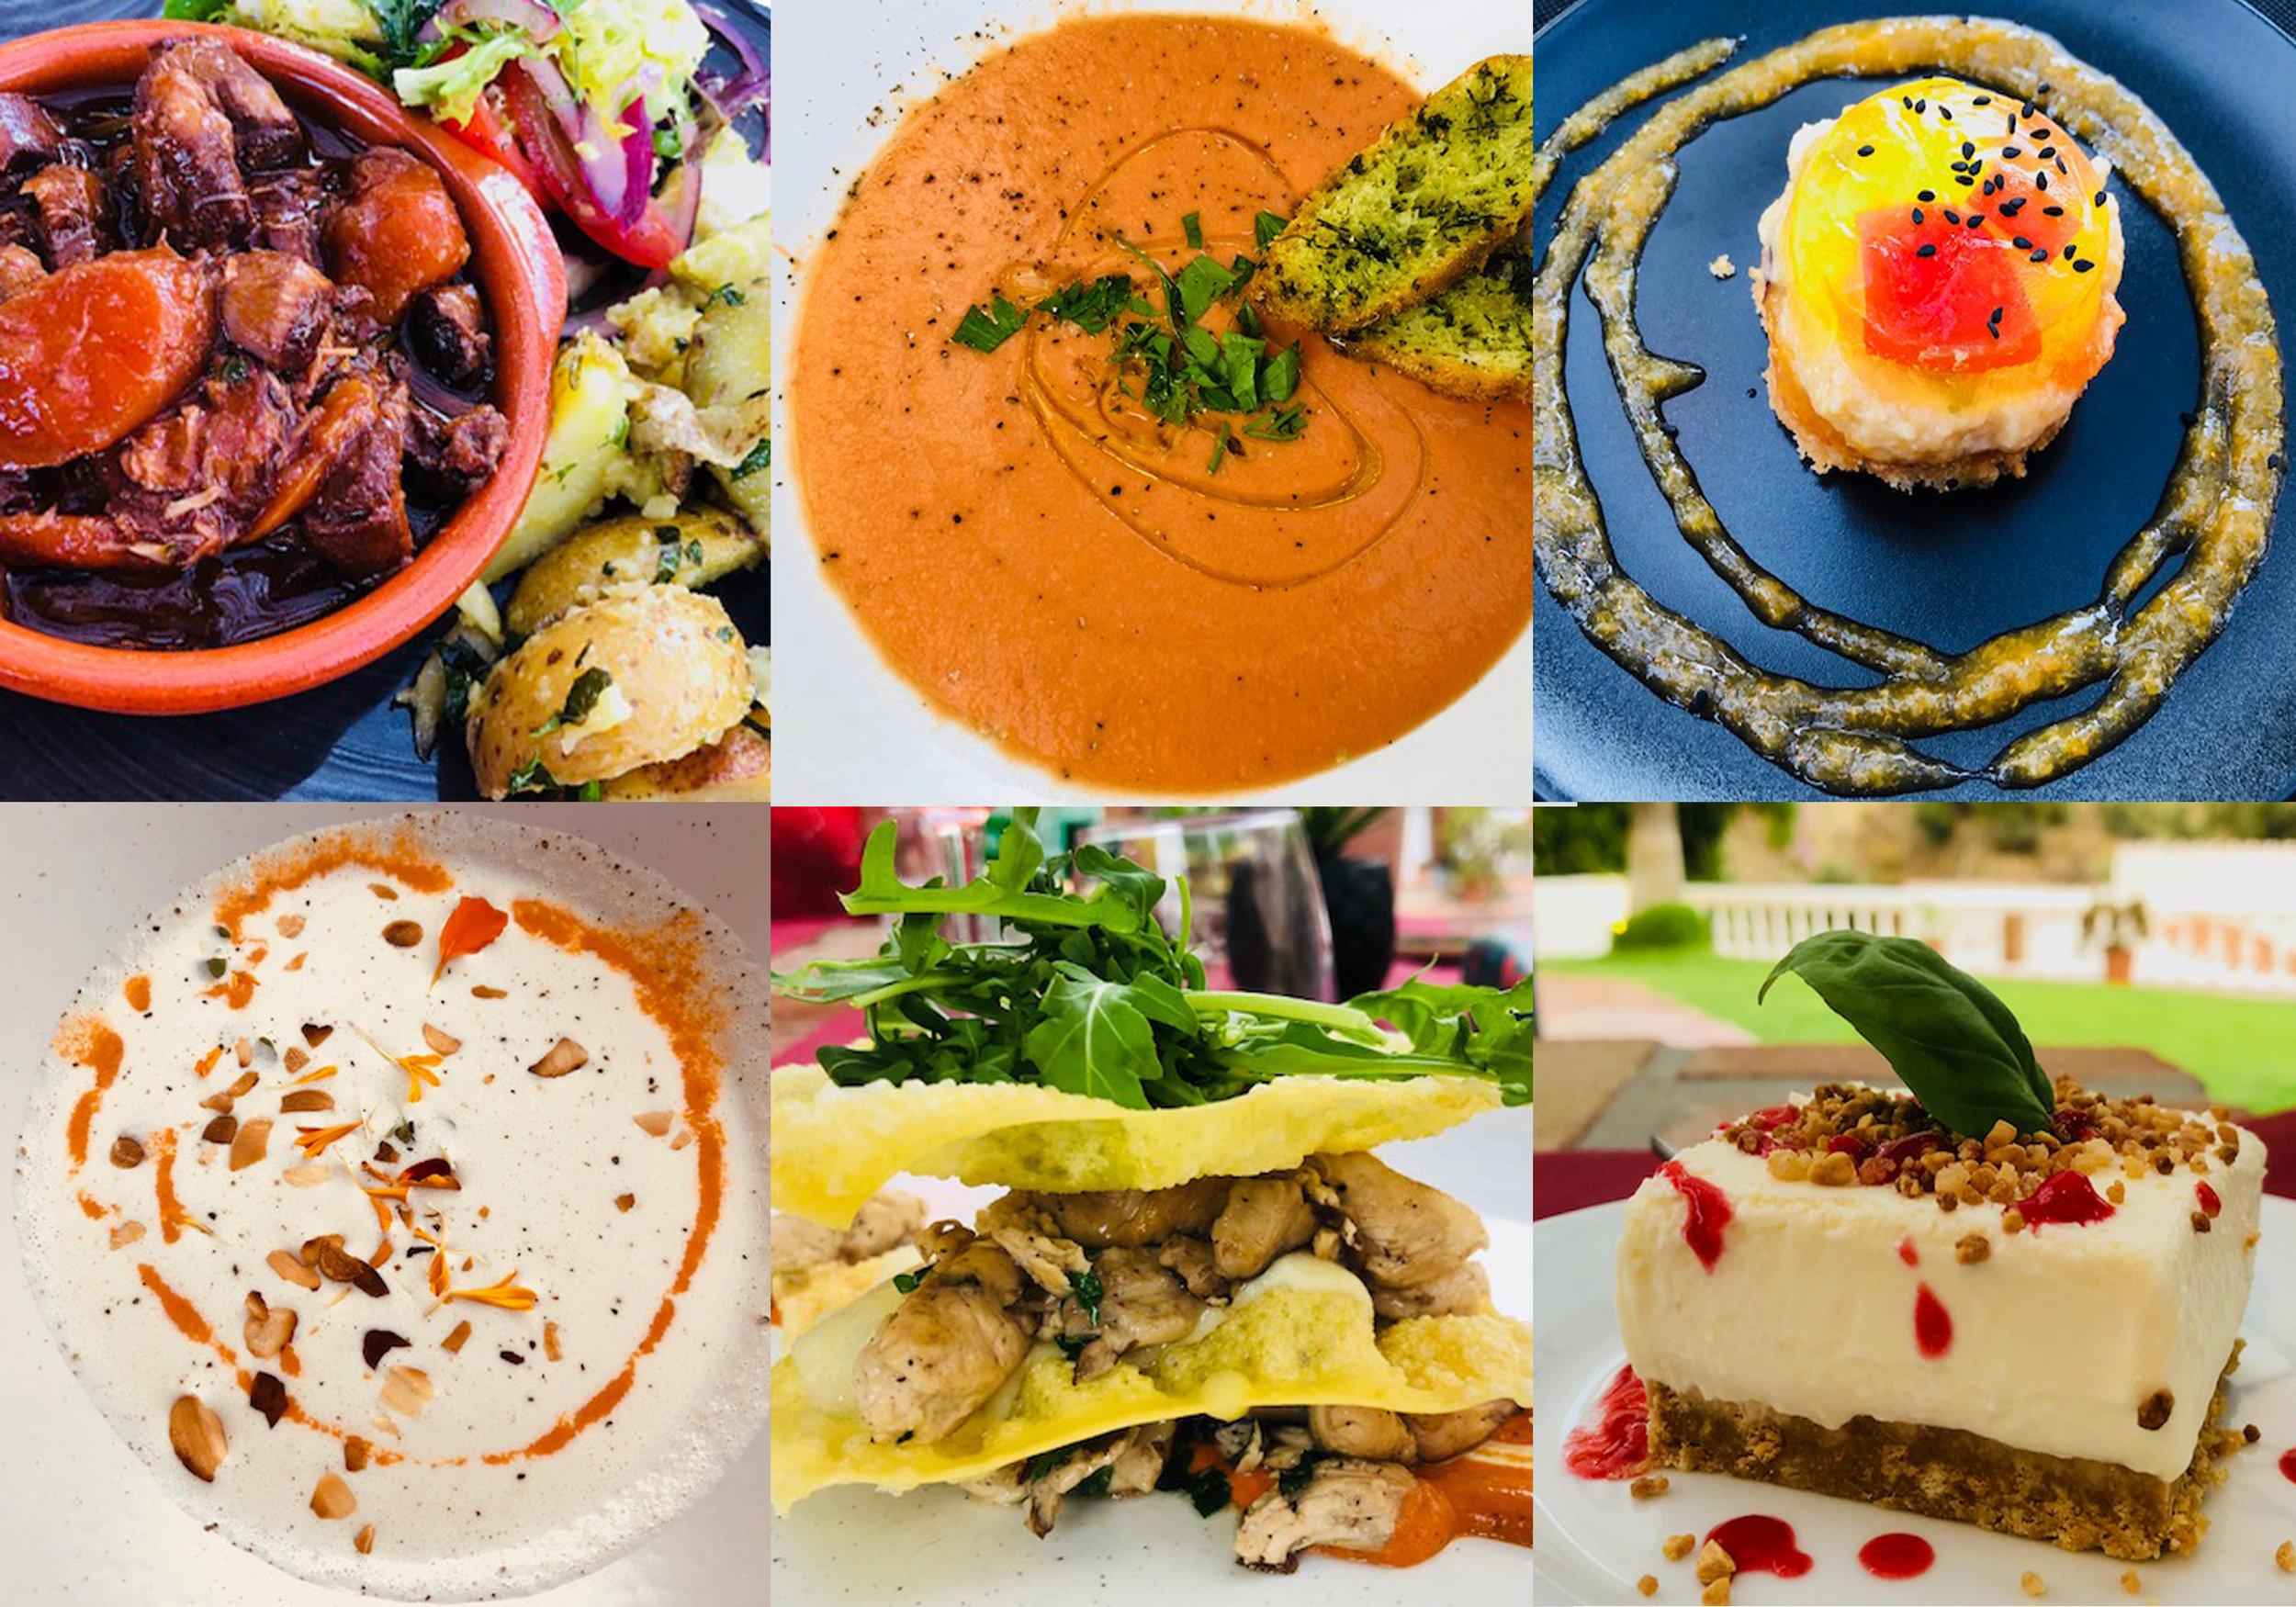 Food Composite.jpg